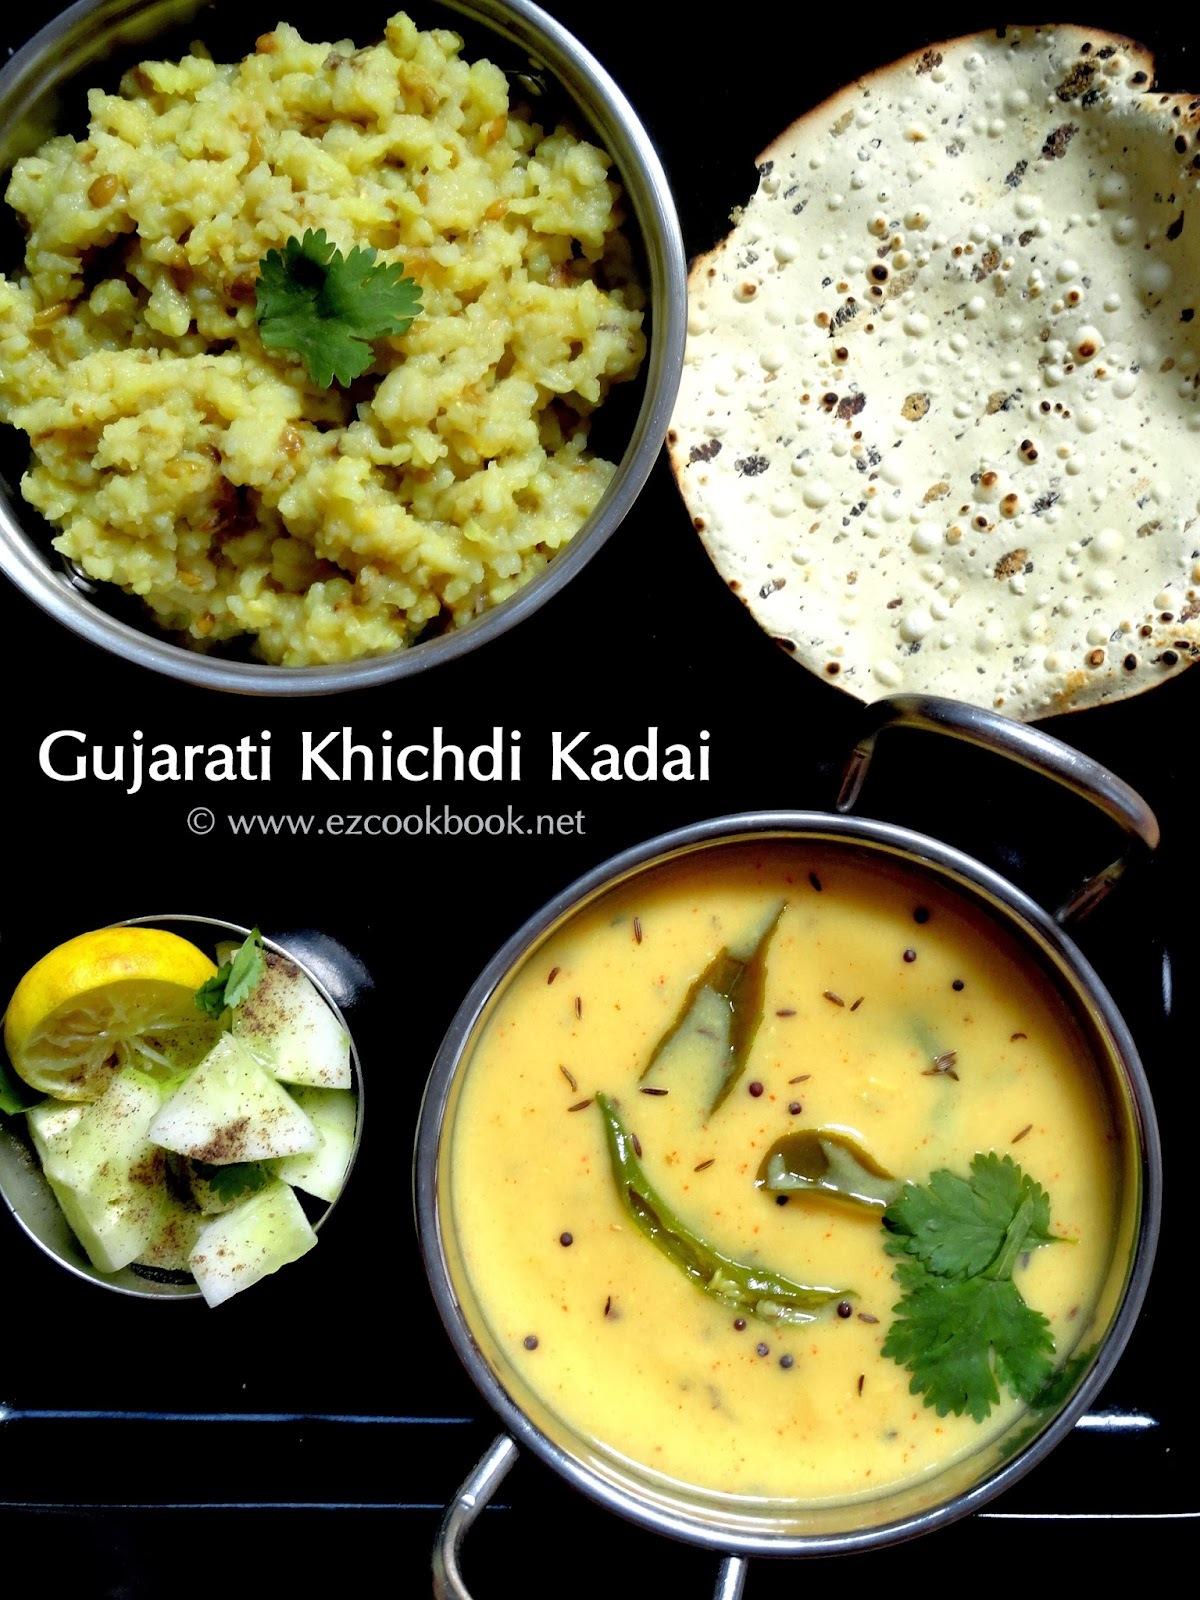 Gujarati Khichdi Kadhi